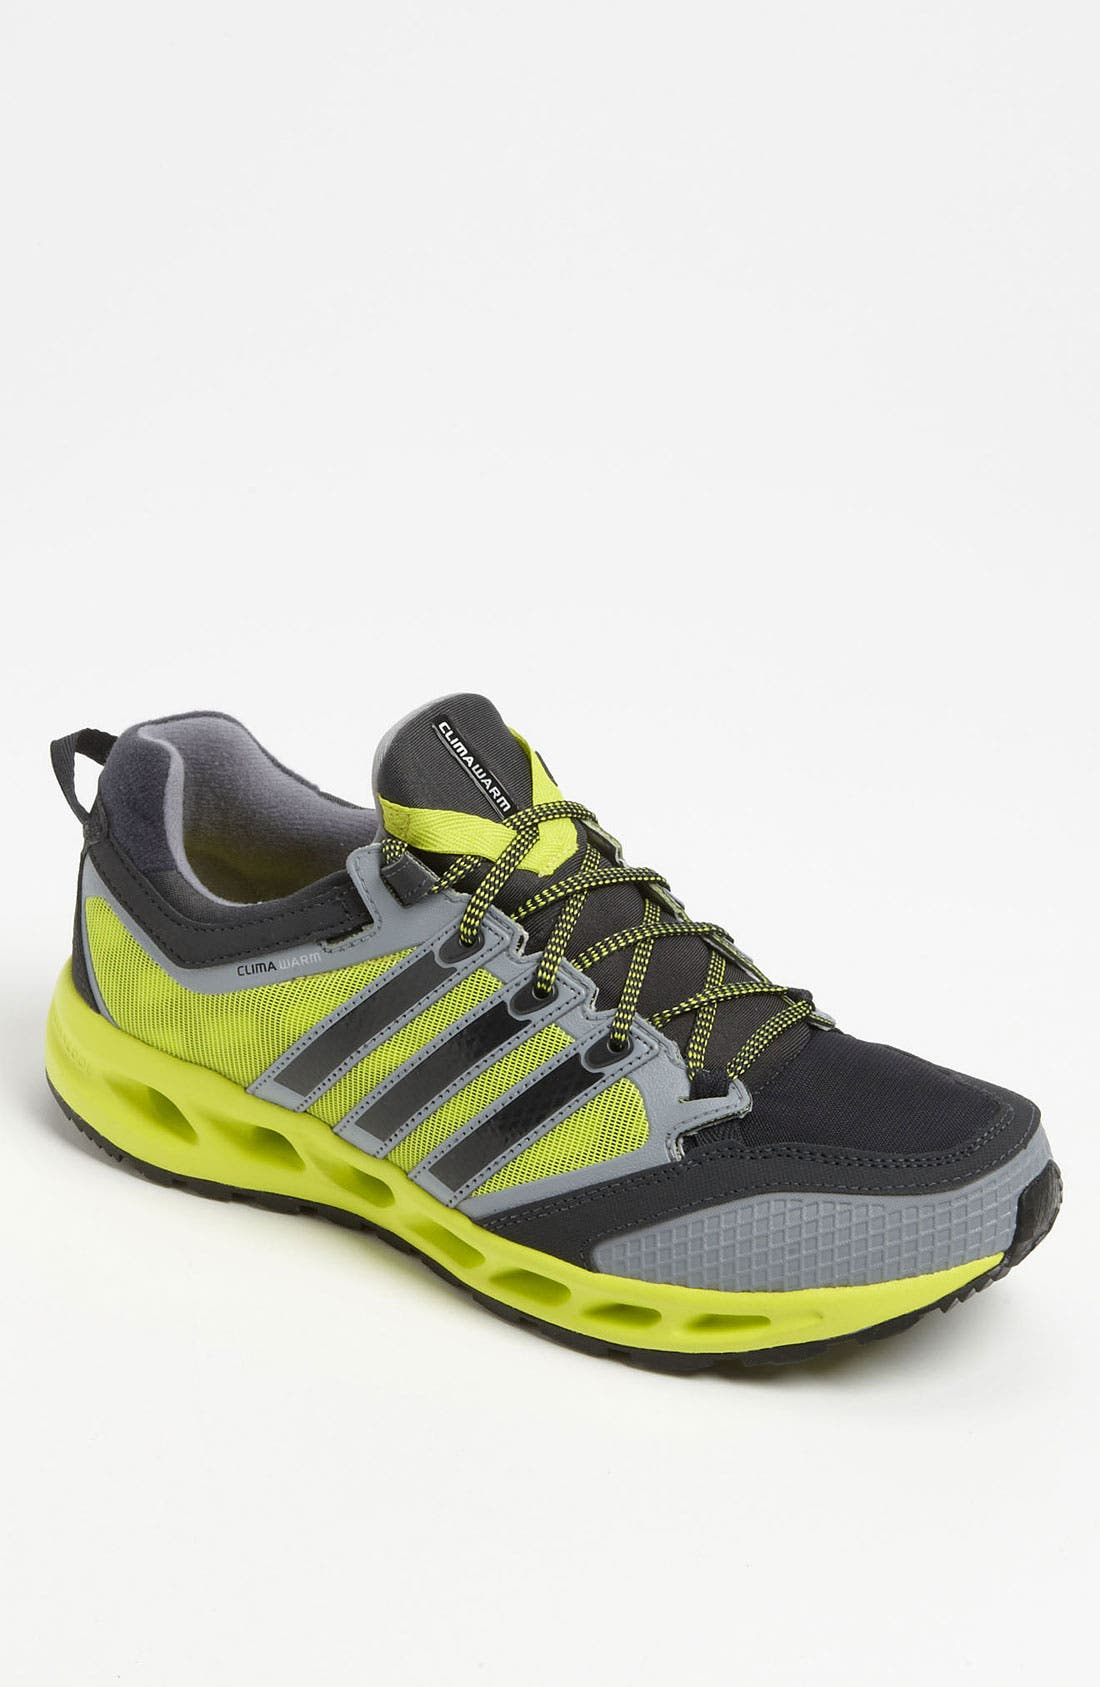 Main Image - adidas 'Tempest' Running Shoe (Men)